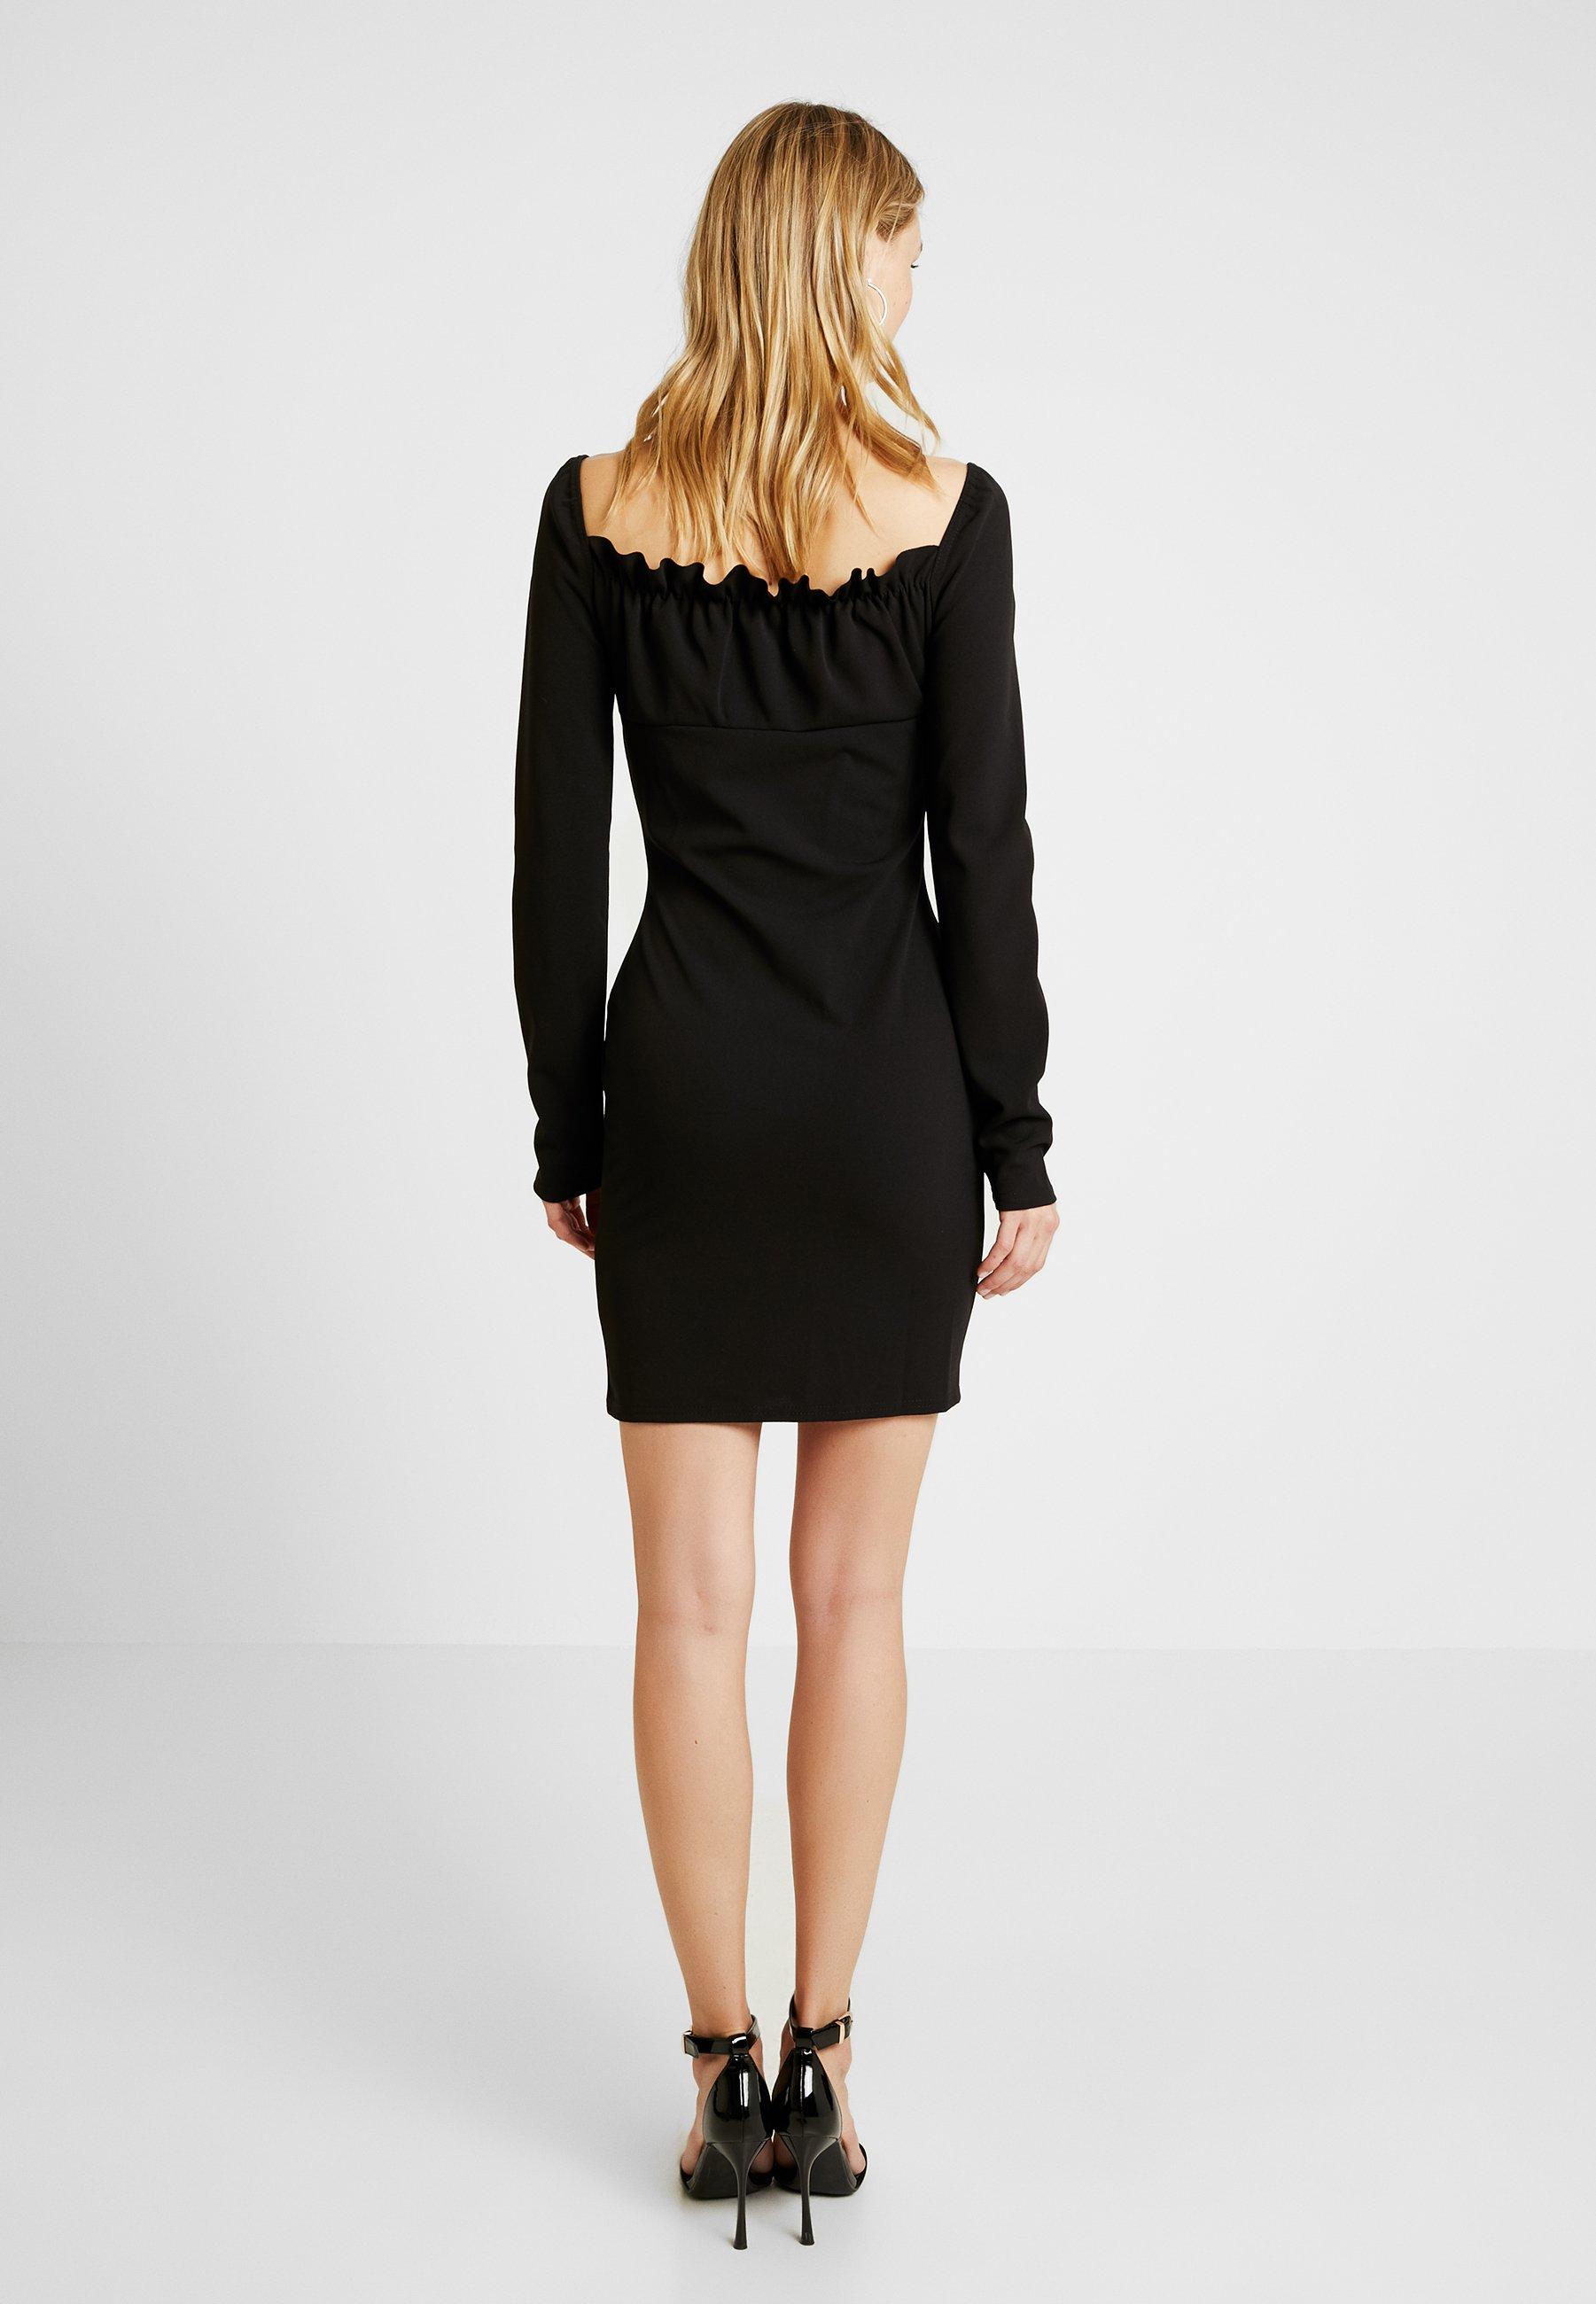 Tall Missguided Tie Milkmaid DressRobe Mini Front Soirée Black De w0PnkO